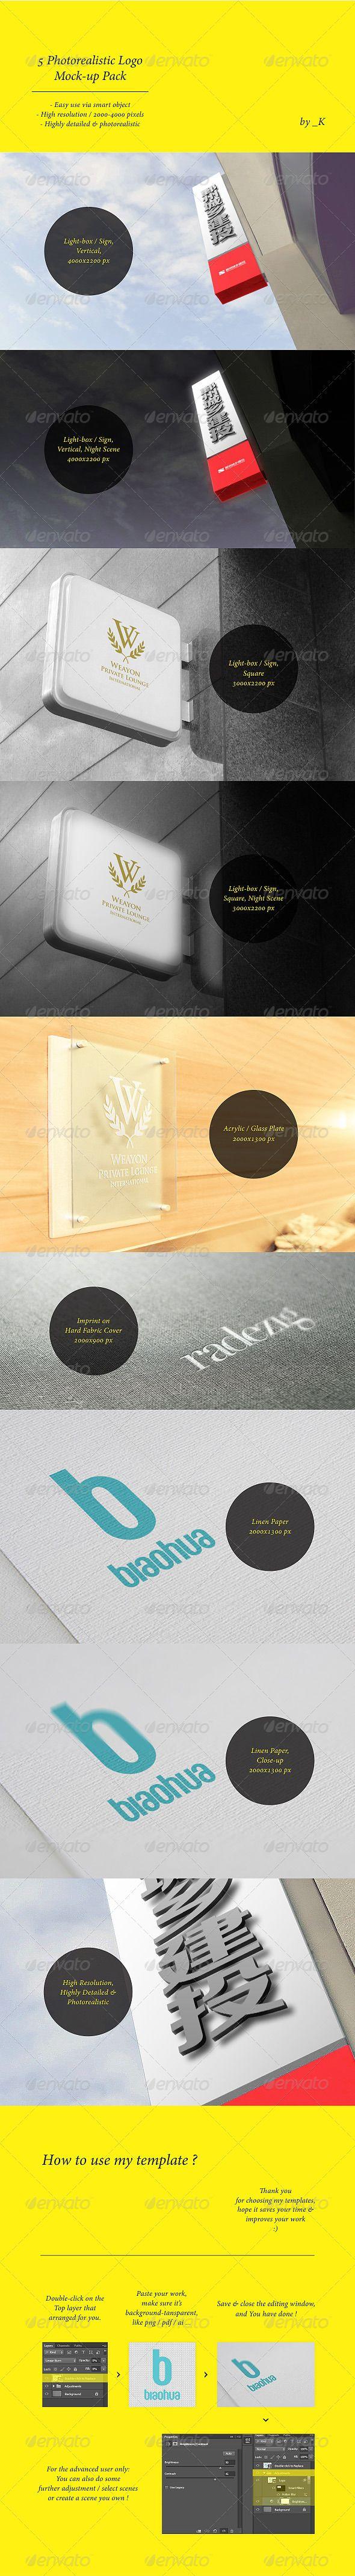 5 Unique Photorealistic Logo Display Mock-up Pack - Logo Product Mock-Ups